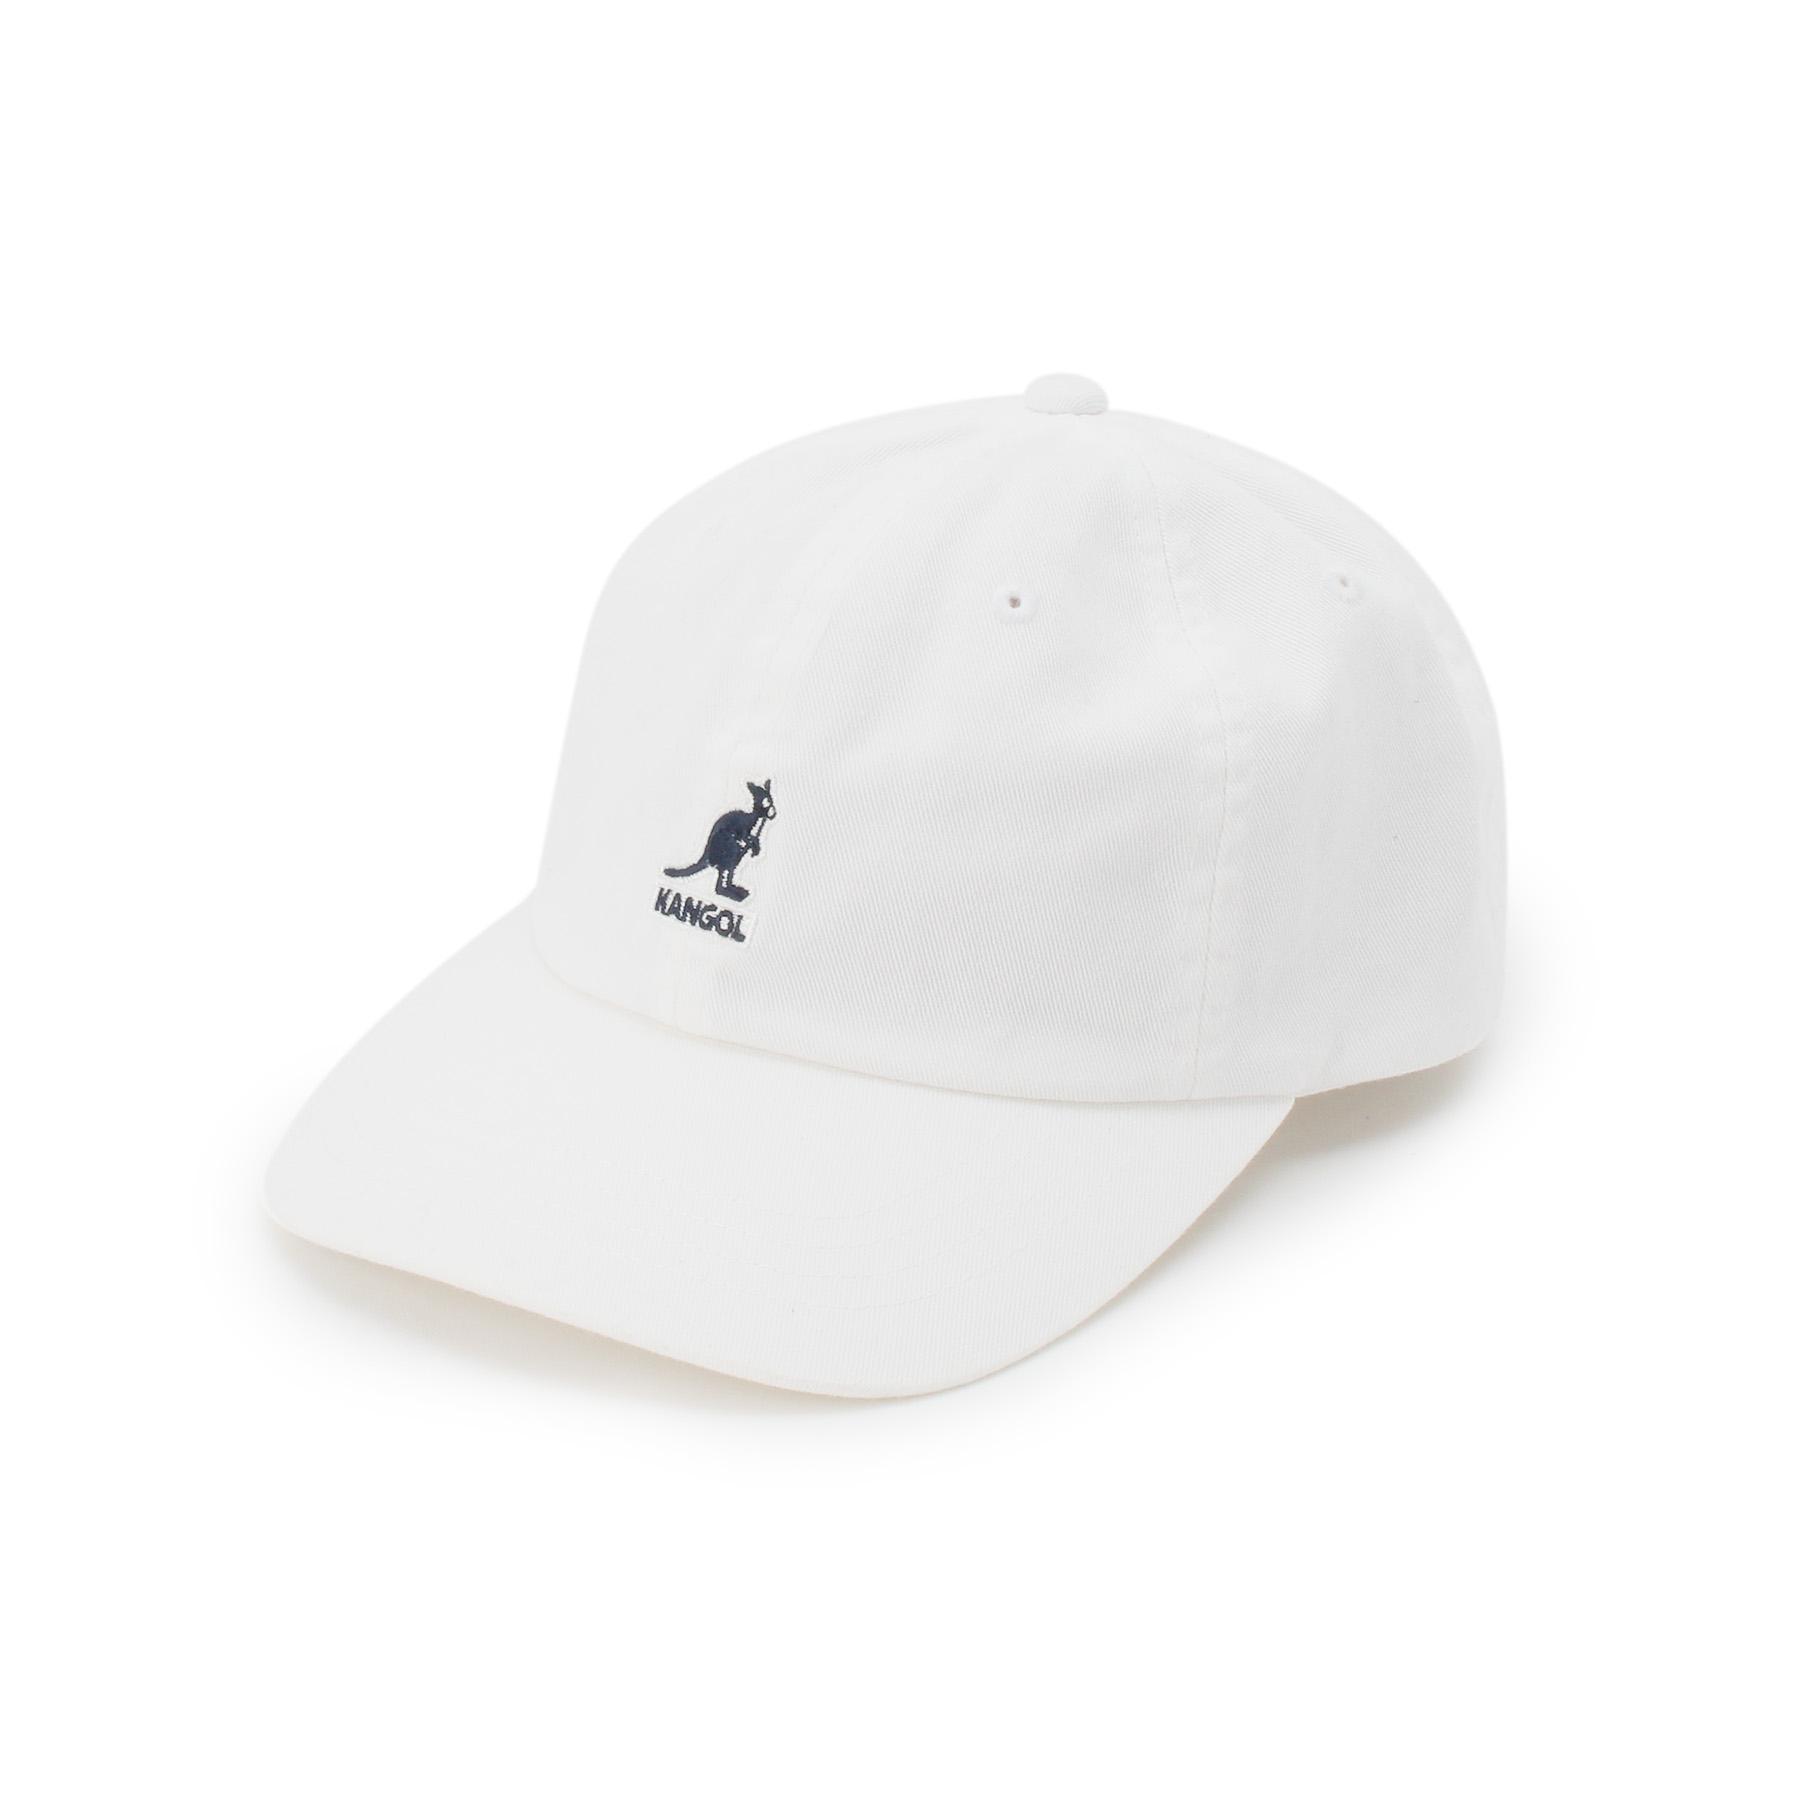 【BASECONTROL (ベース コントロール)】【WEB限定】KANGOL/カンゴール ローキャップメンズ 帽子 キャップ アイボリー